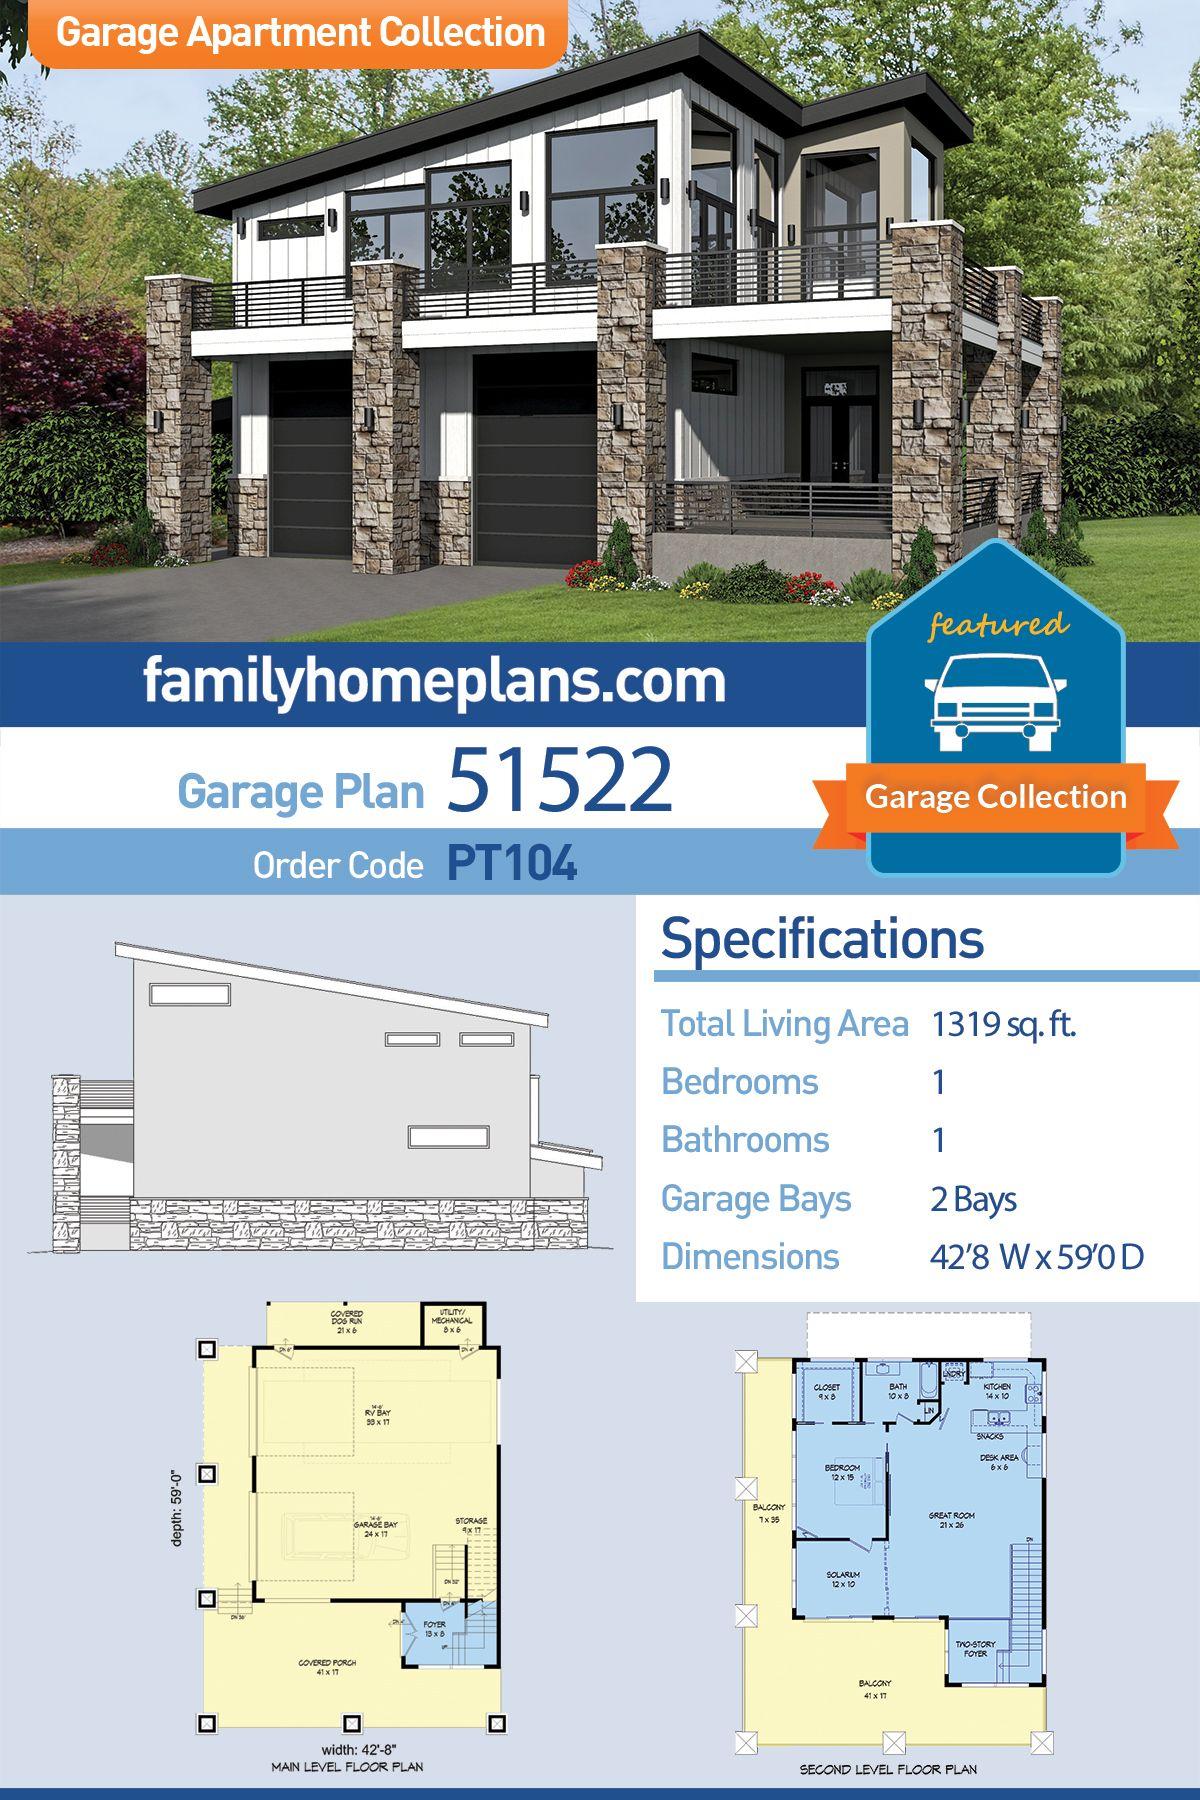 Modern Style Garage Living Plan 51522 With 1 Bed 1 Bath 2 Car Garage Garage Apartment Plan Garage Apartments Garage Plans